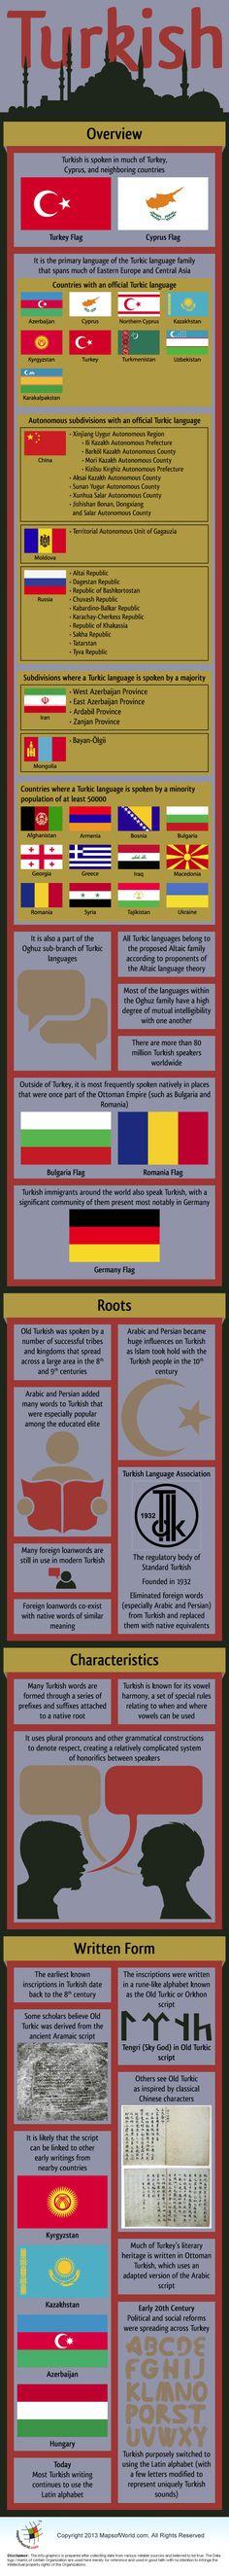 Infographic of Turkish Language.